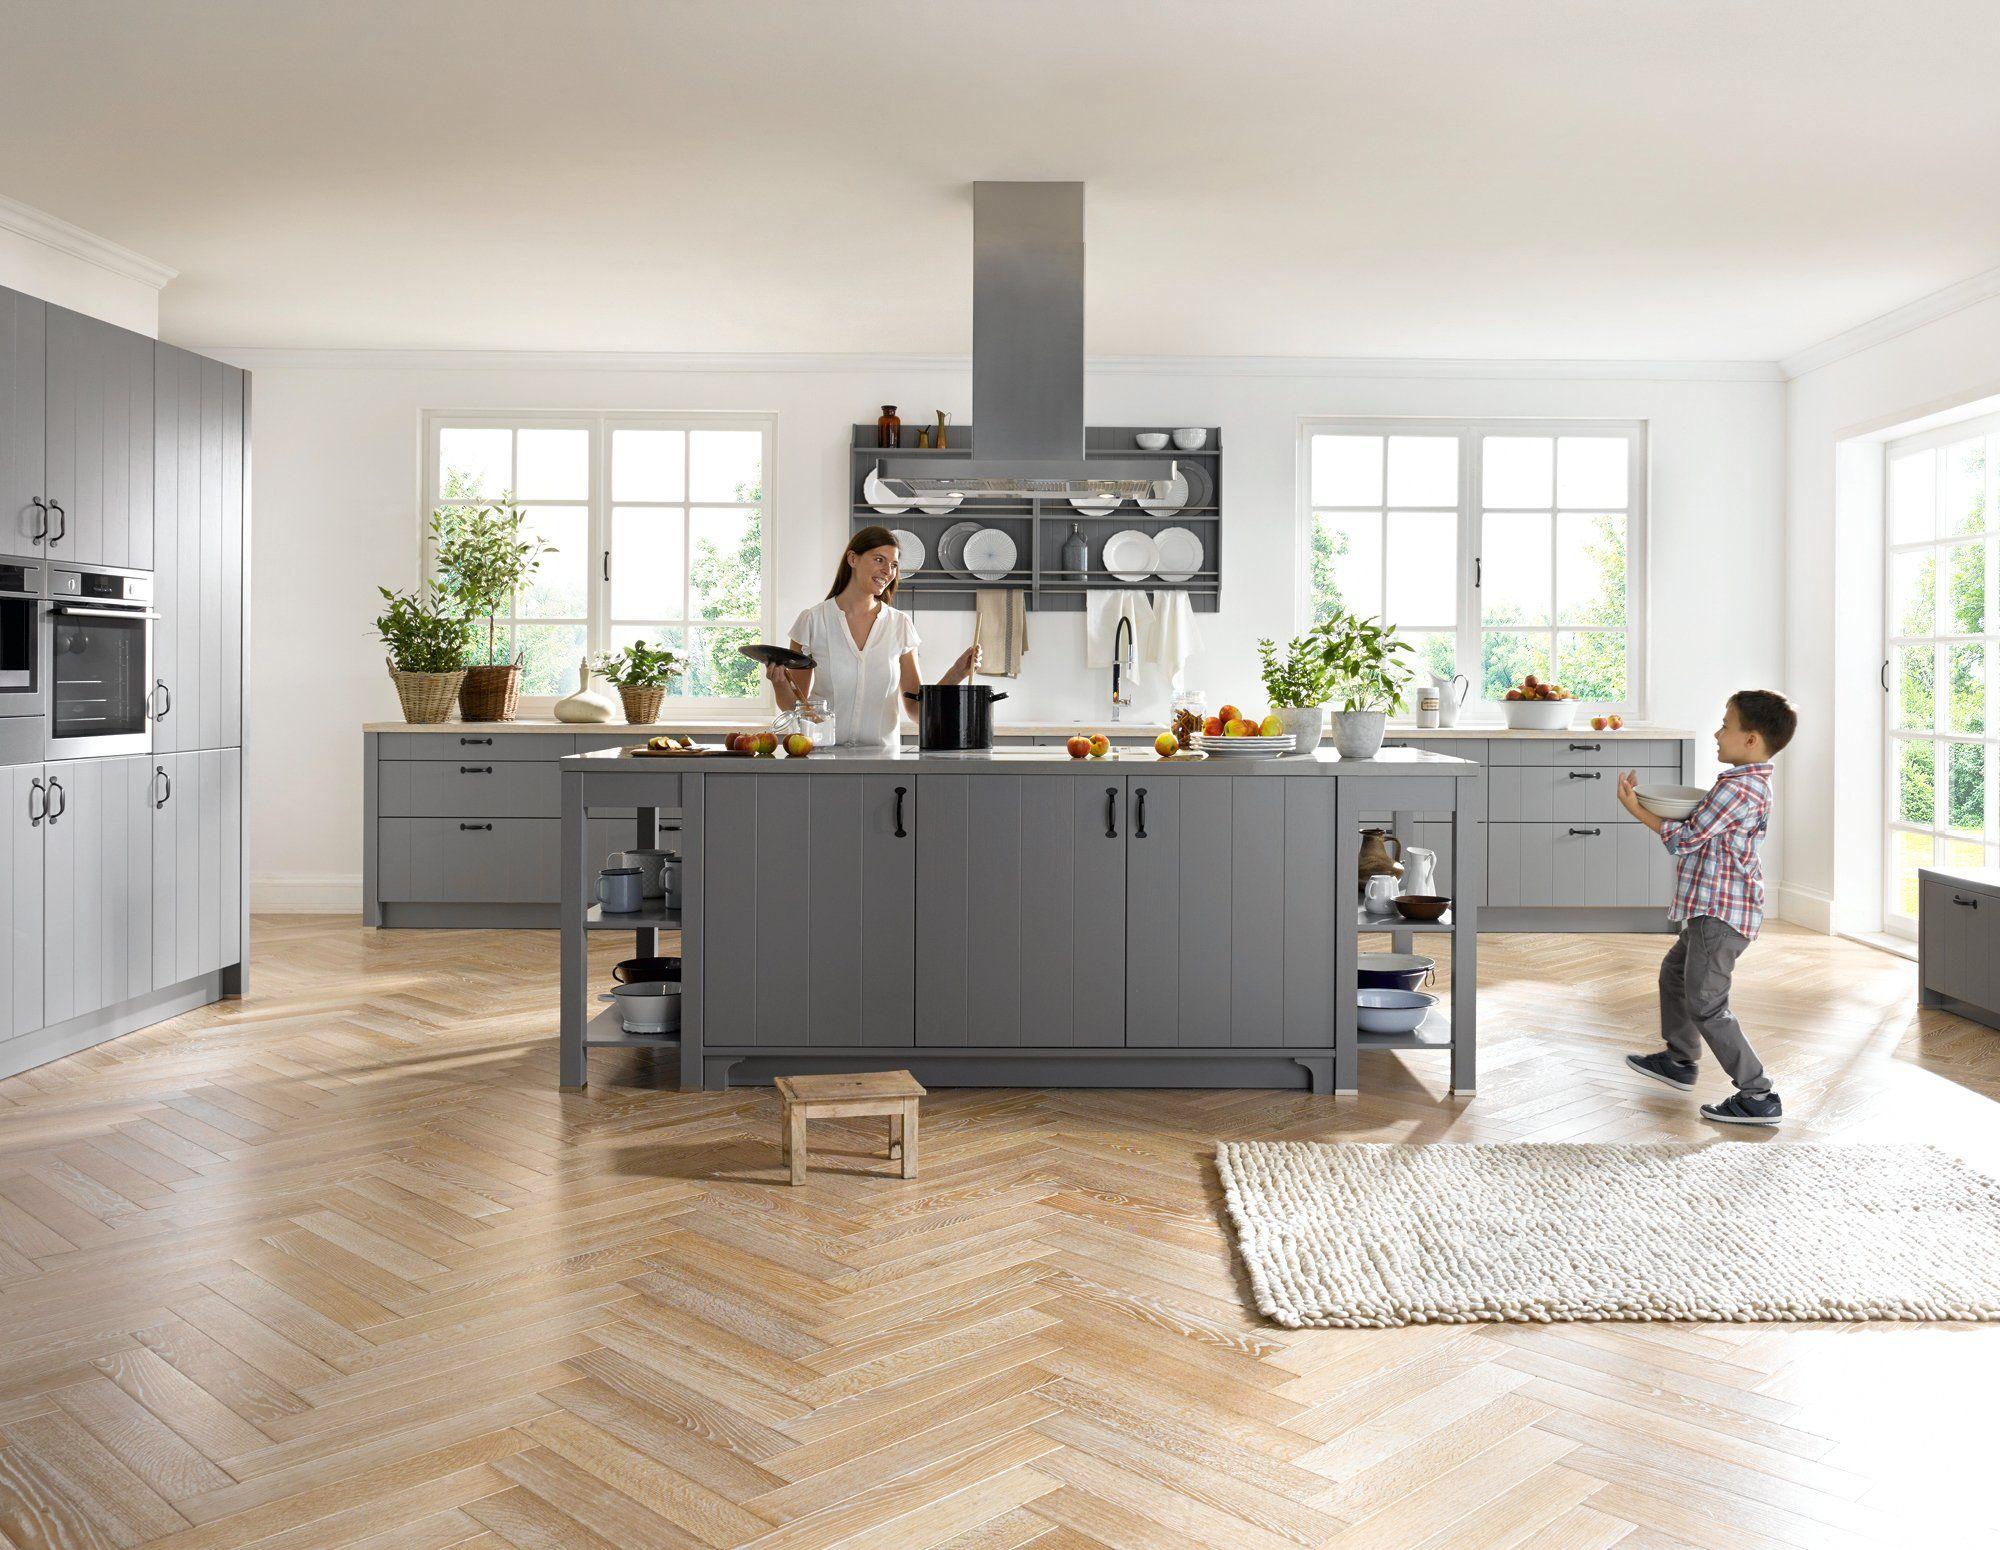 global 55 210 landhauskuche in lack grau landhauskuchen pinterest kuchen mobel um